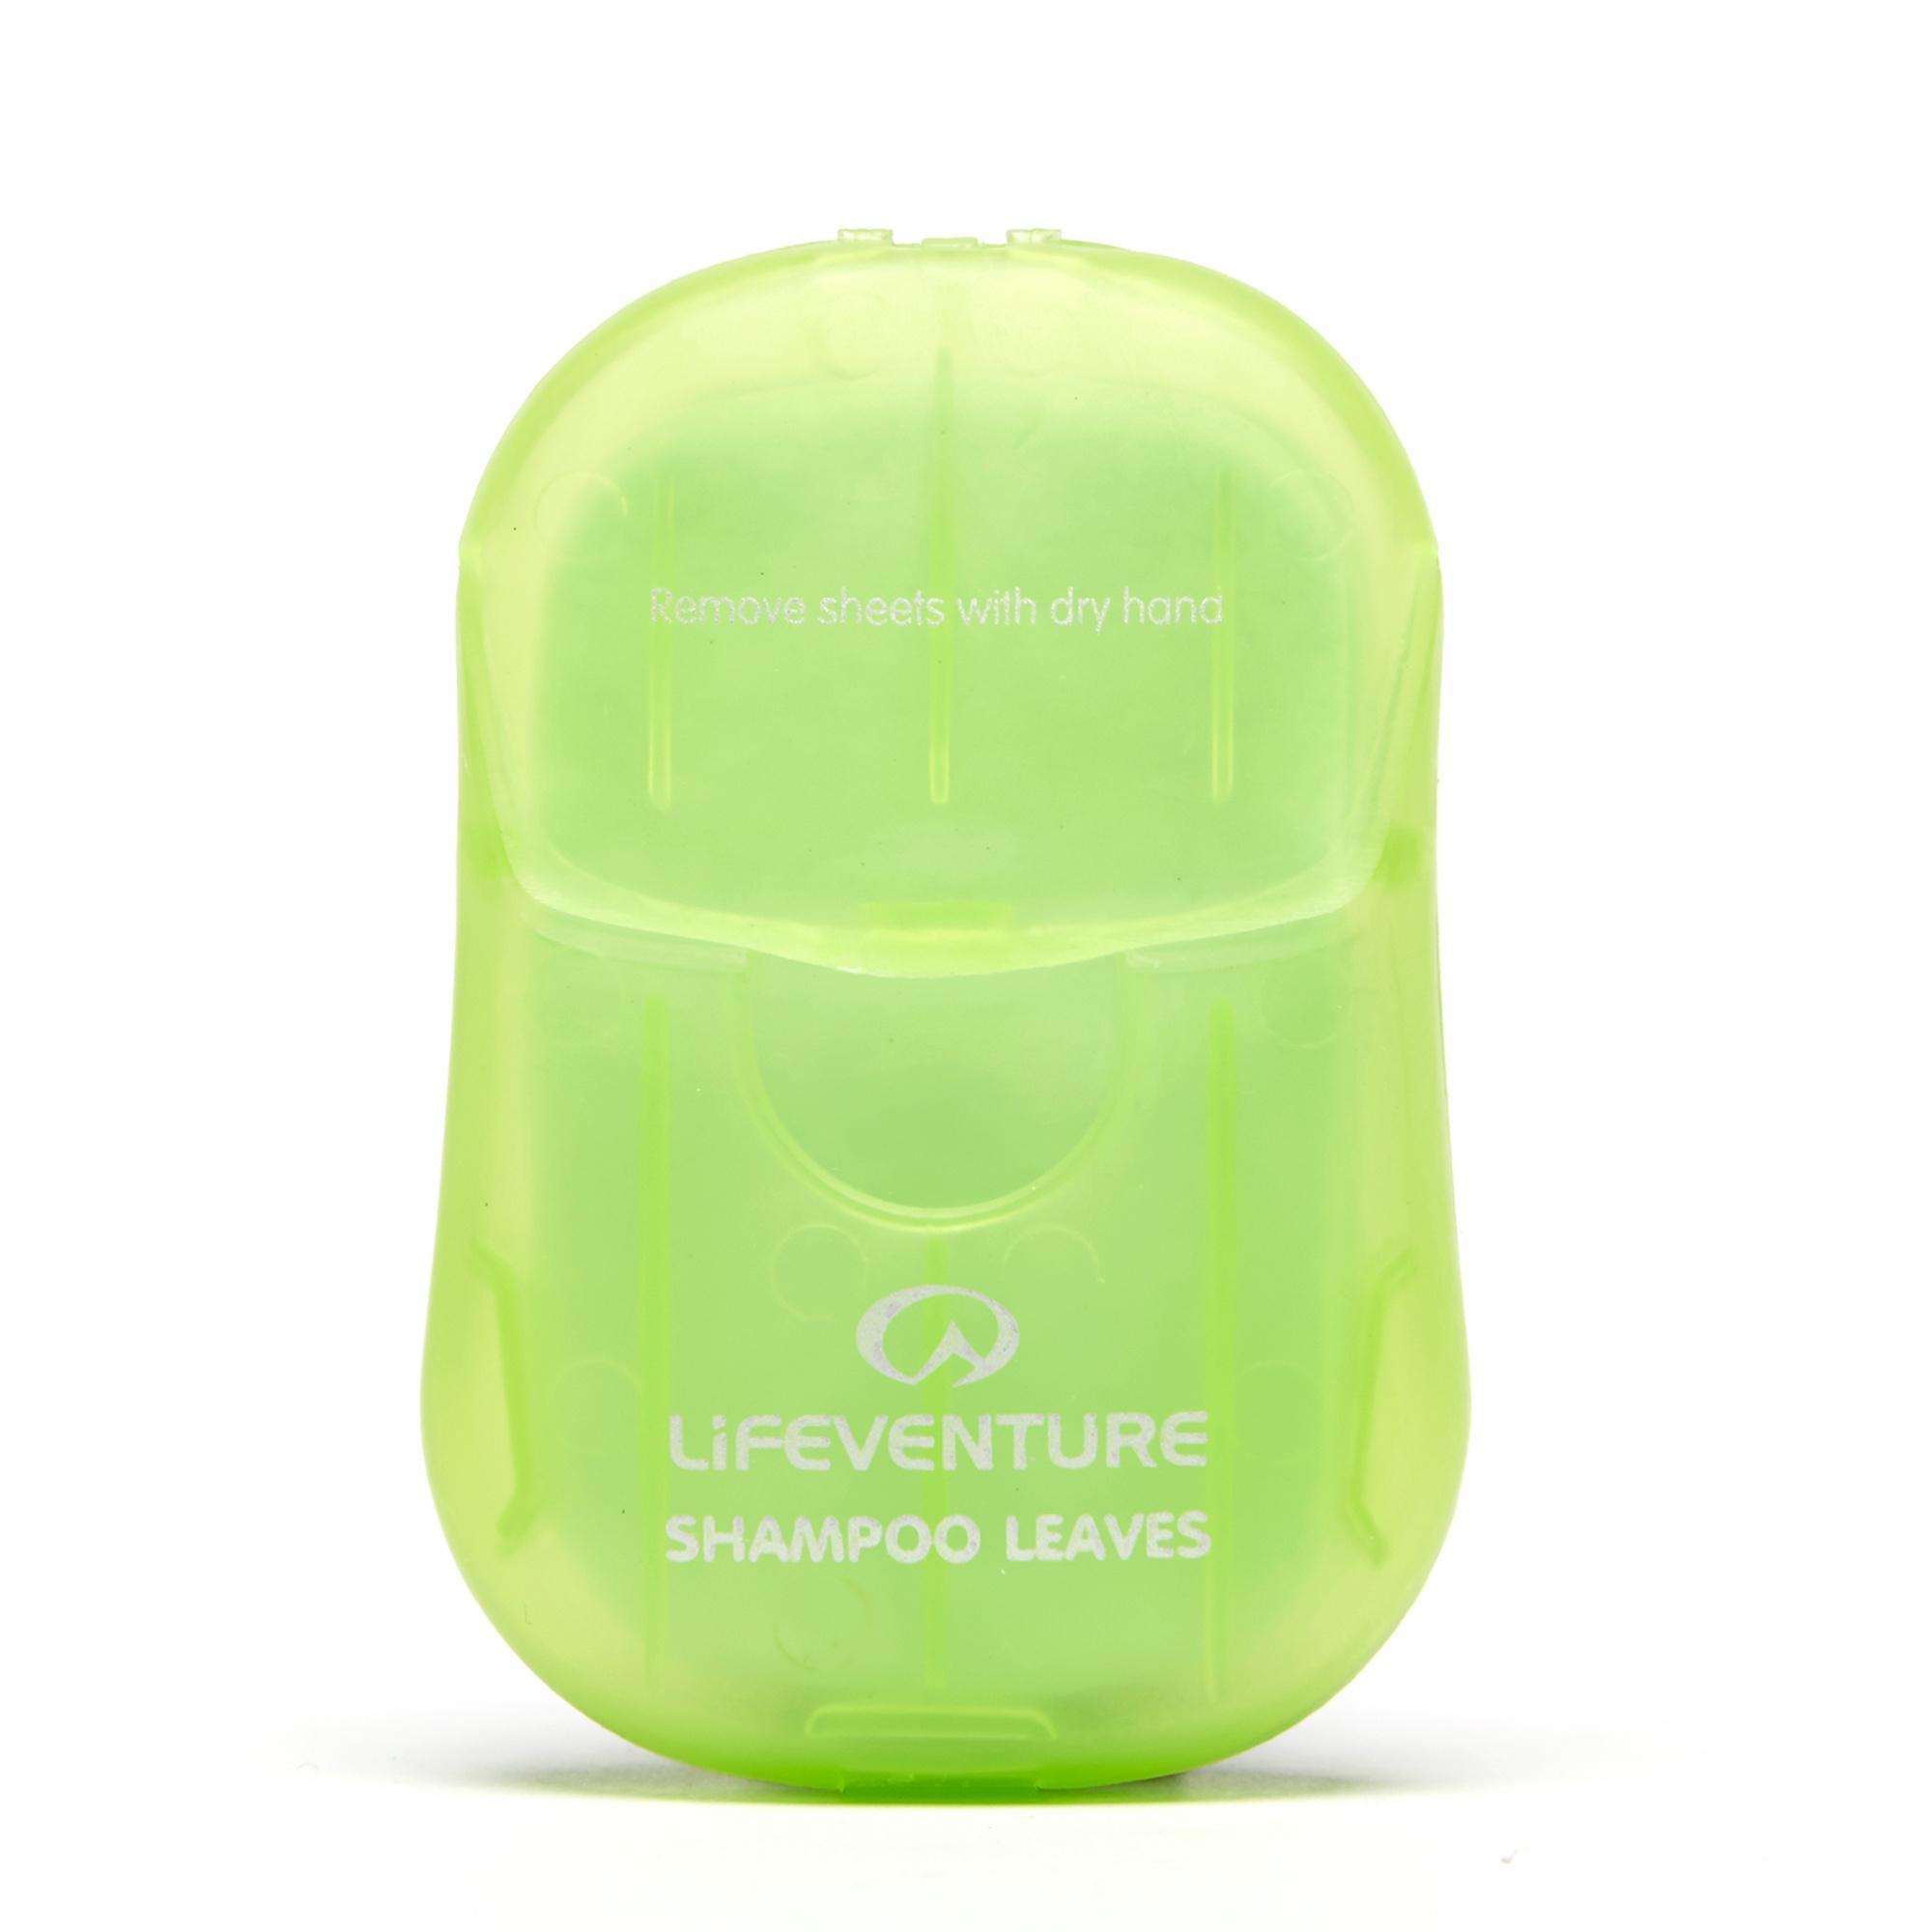 Lifeventure Lifeventure Shampoo Leaves - Green, Green